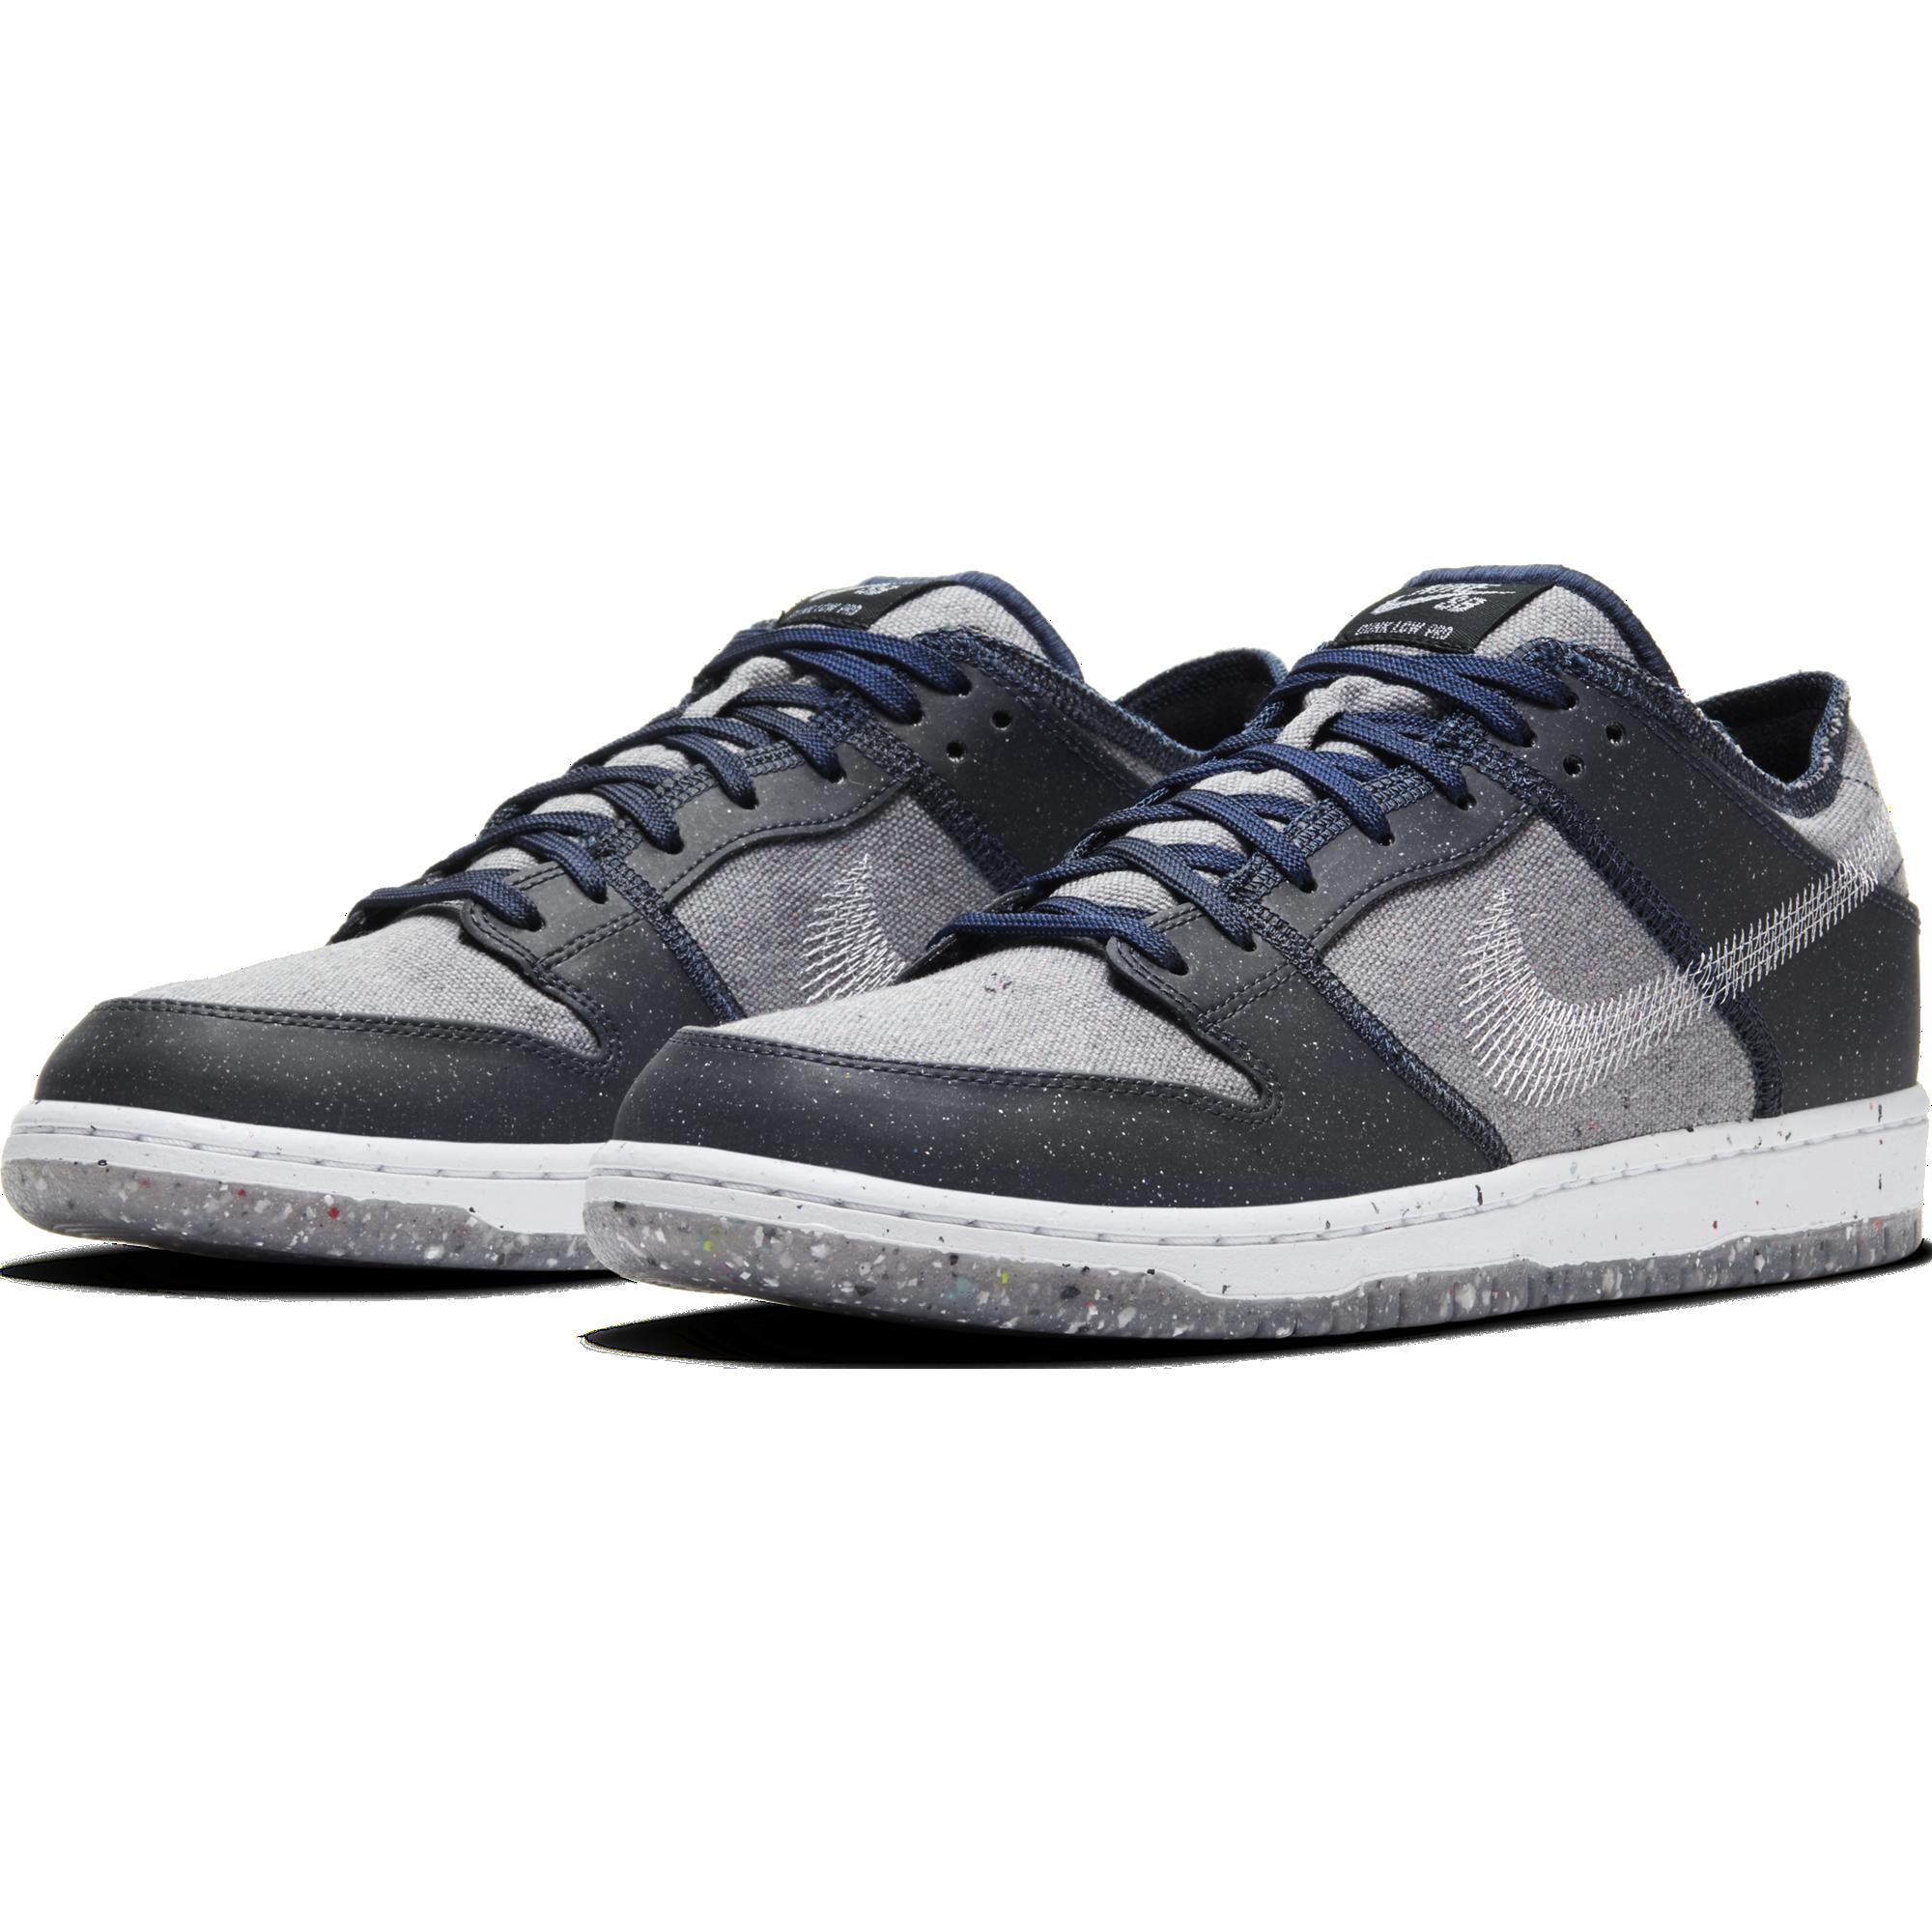 Nike SB Dunk Low Pro E CT2224-001抽選応募フォーム